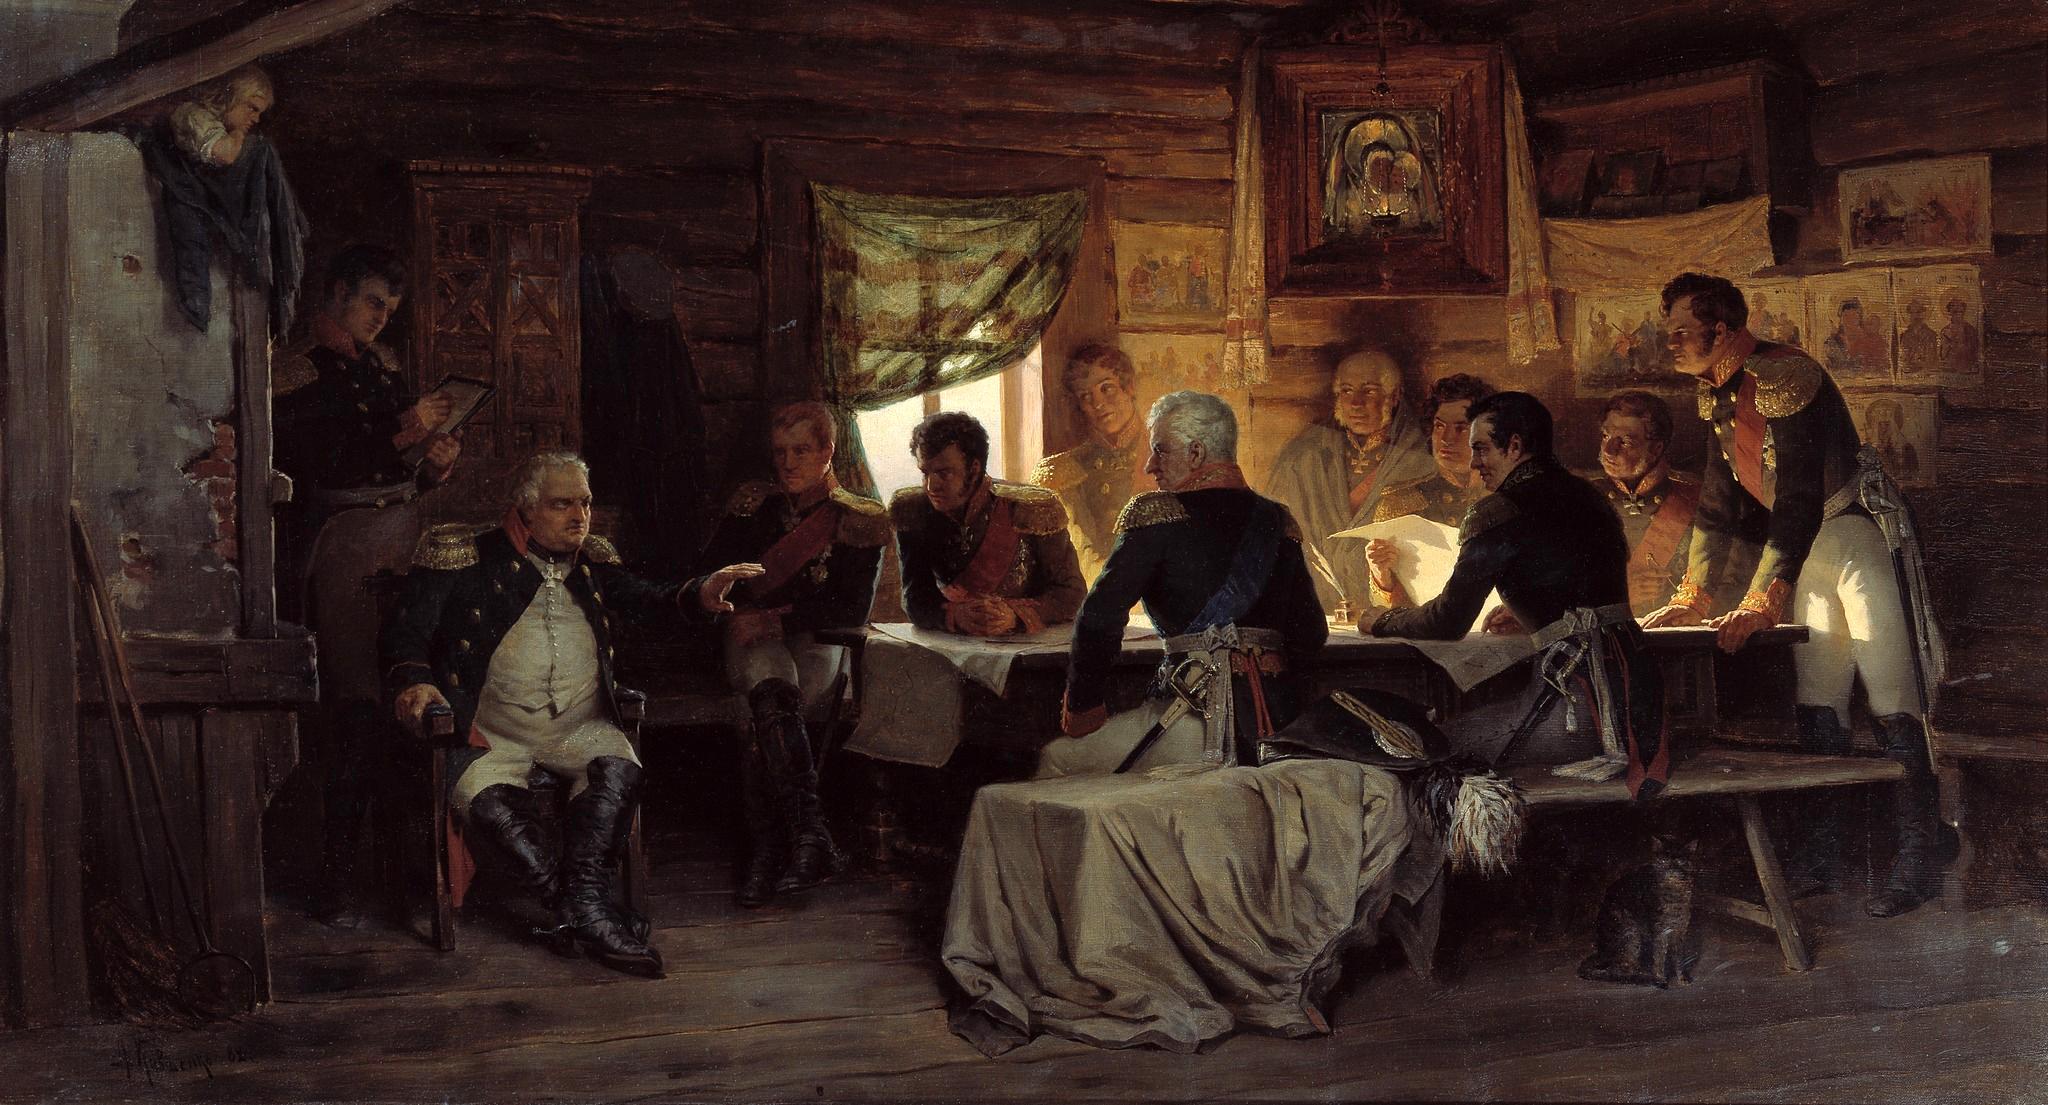 Depiction of Consejo de guerra